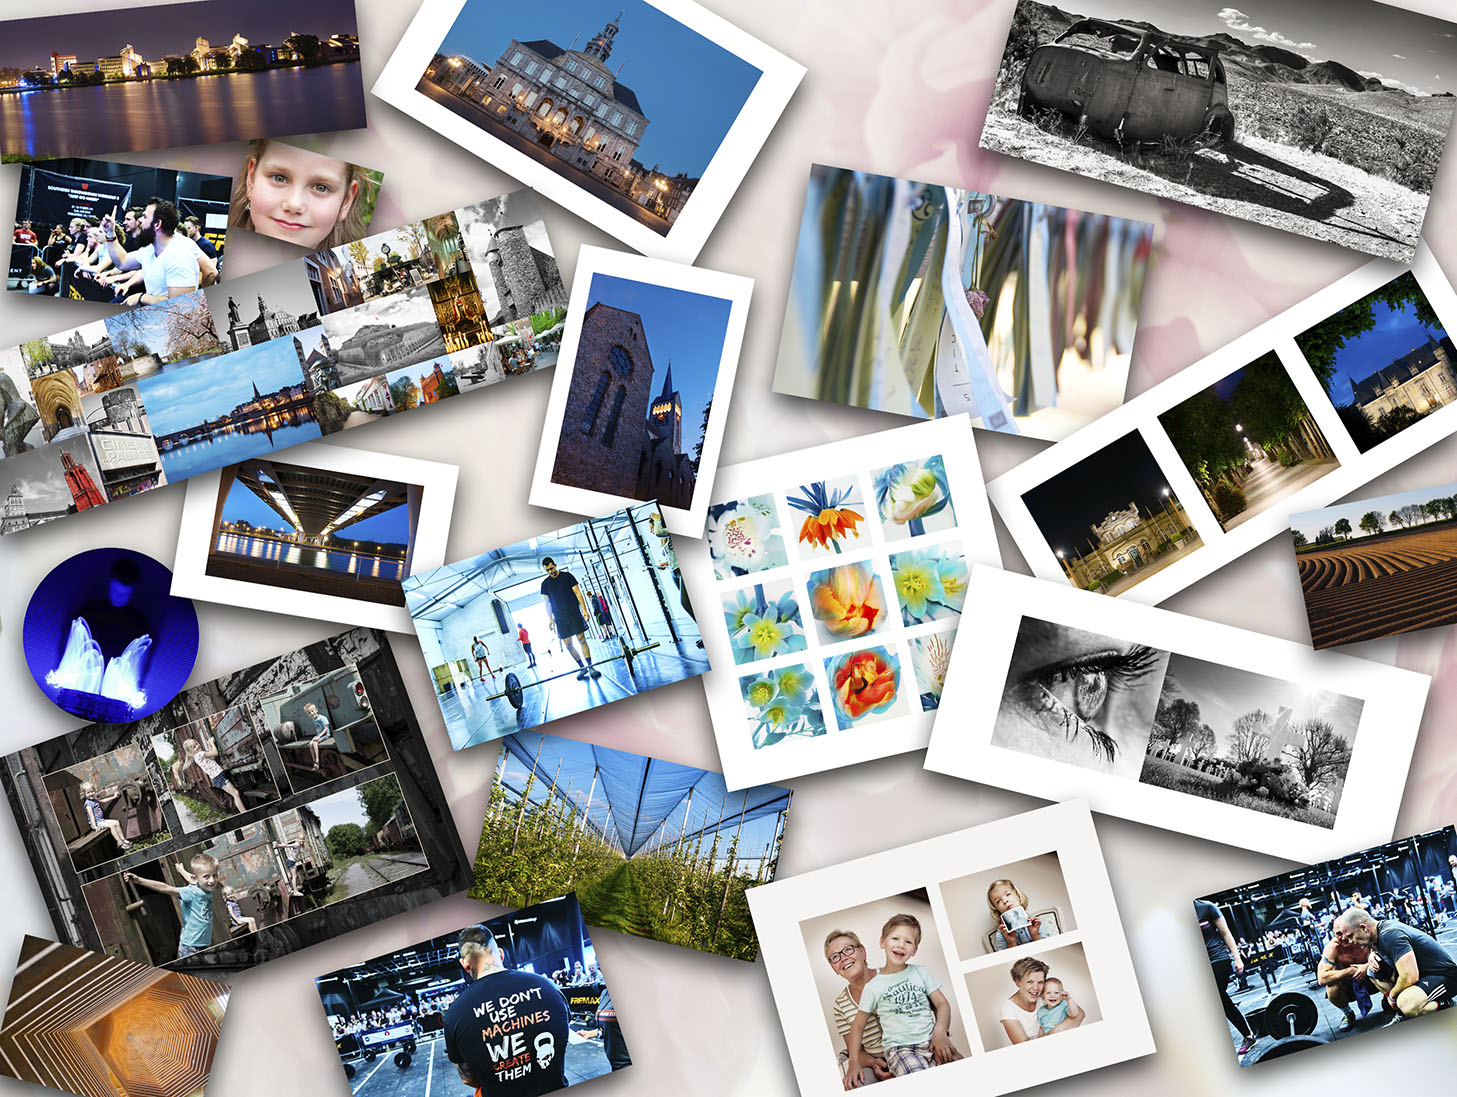 SPUISERS werk cursisten basis cursus digitale fotografie